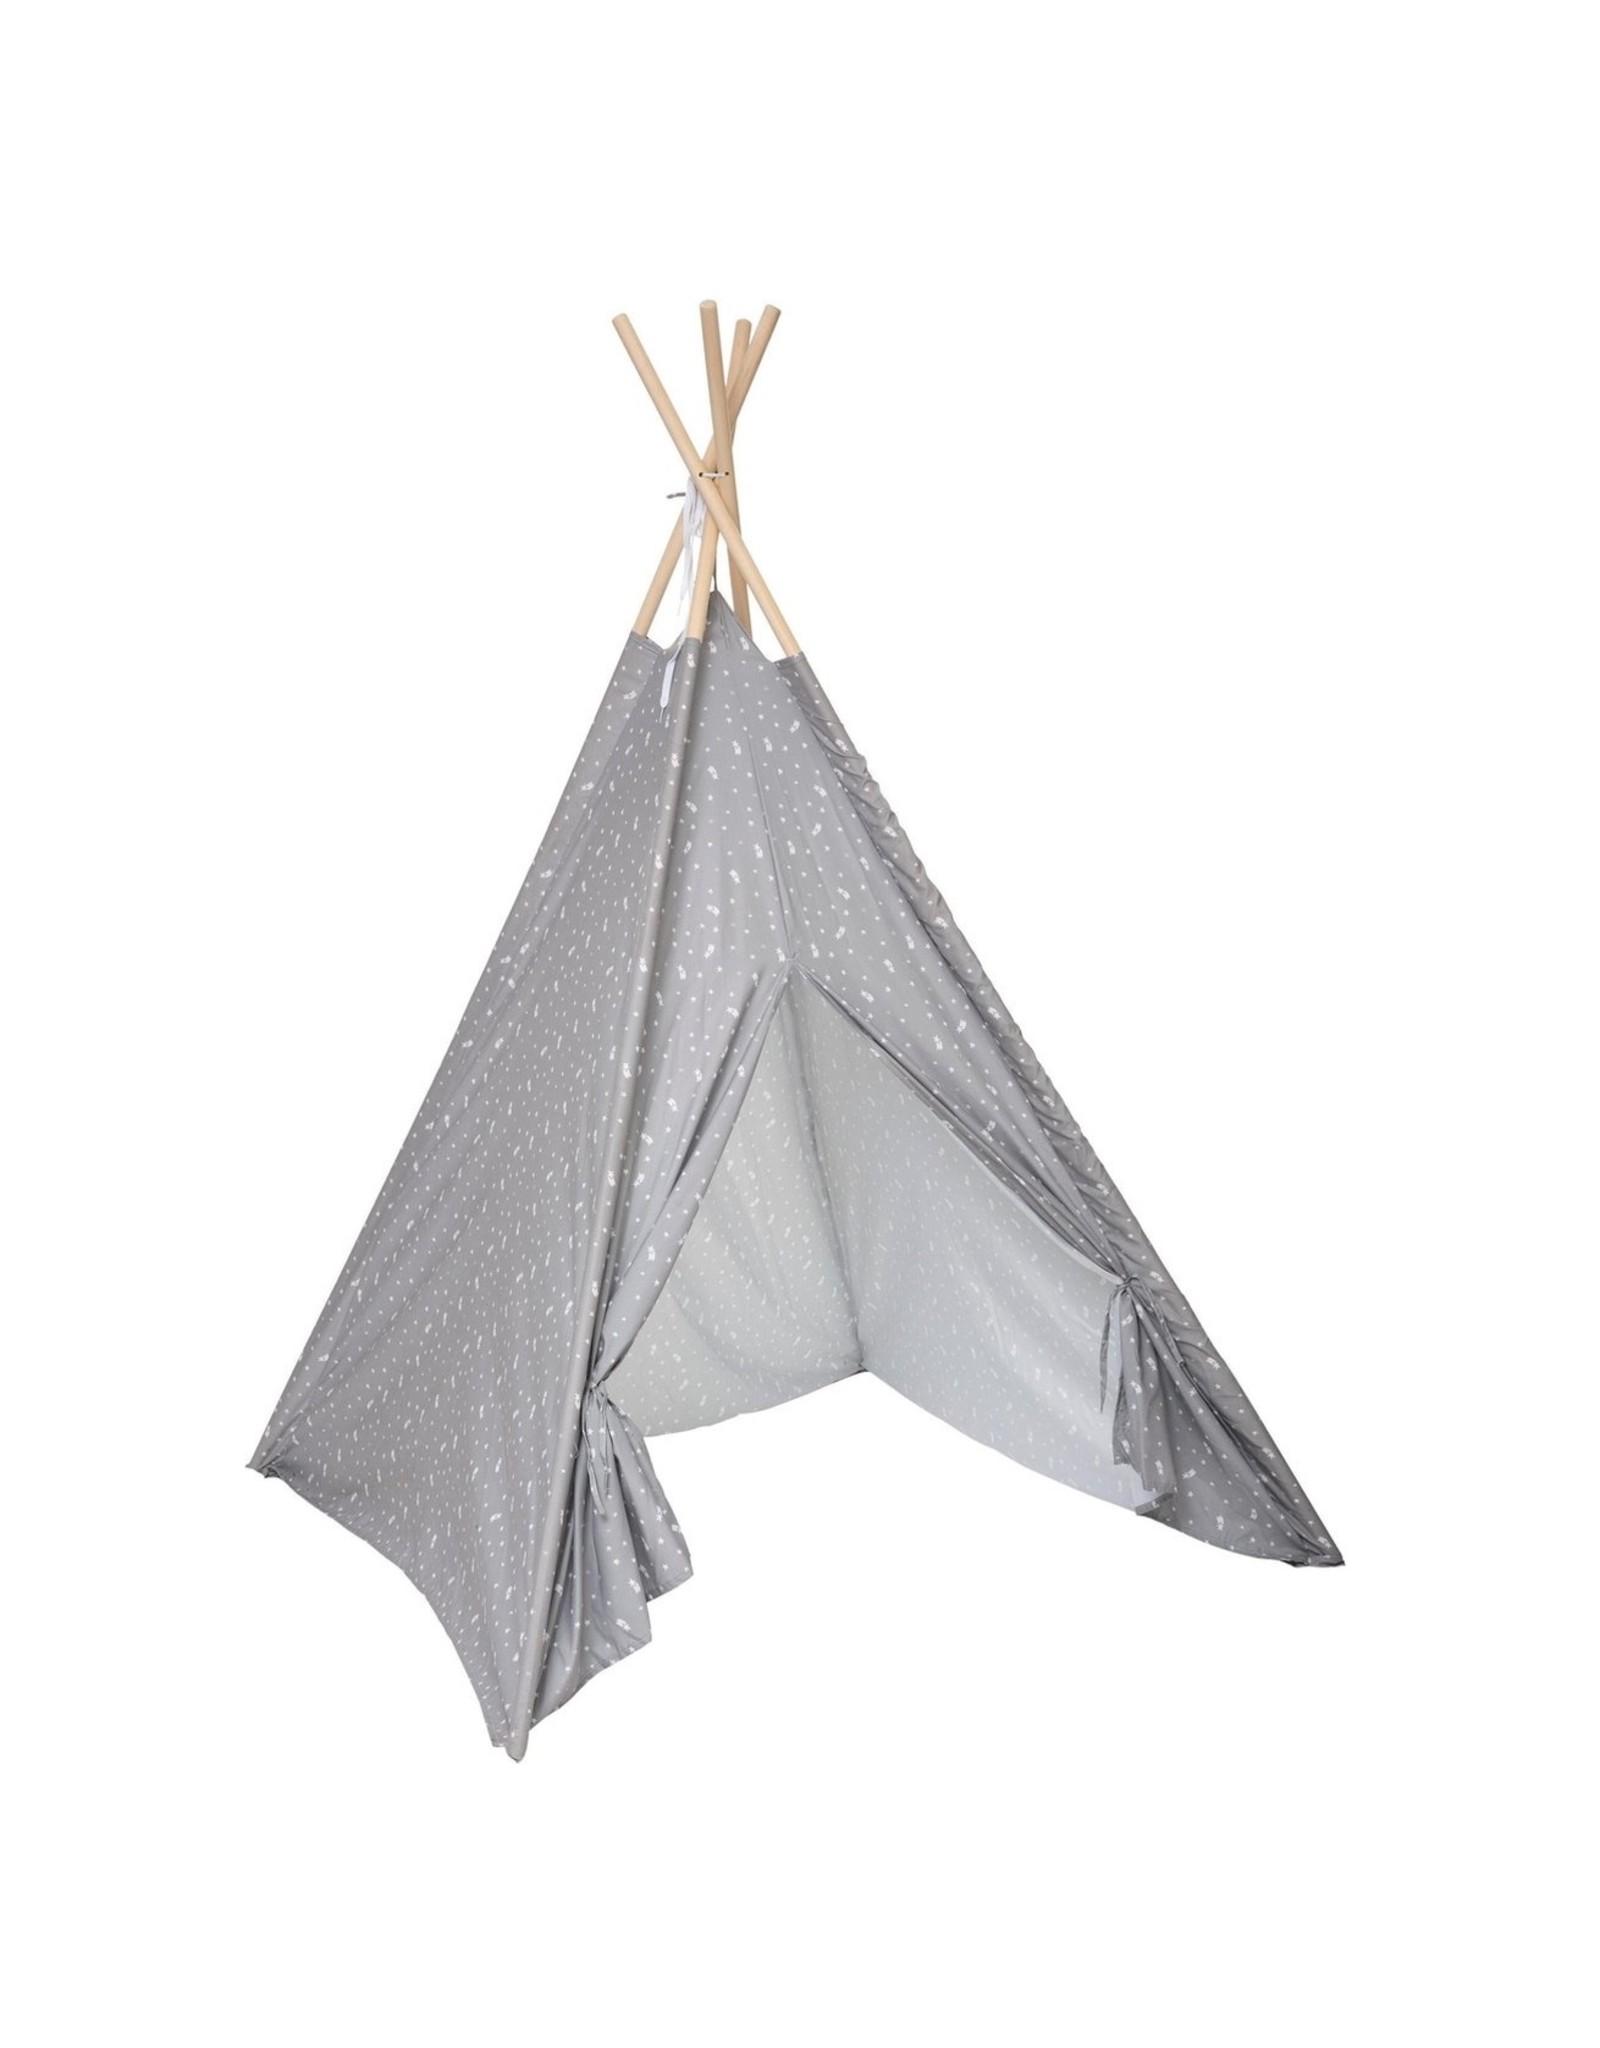 Atmosphera Atmosphera - Kinder Tipi-Tent - Wigwam - Donkergrijs